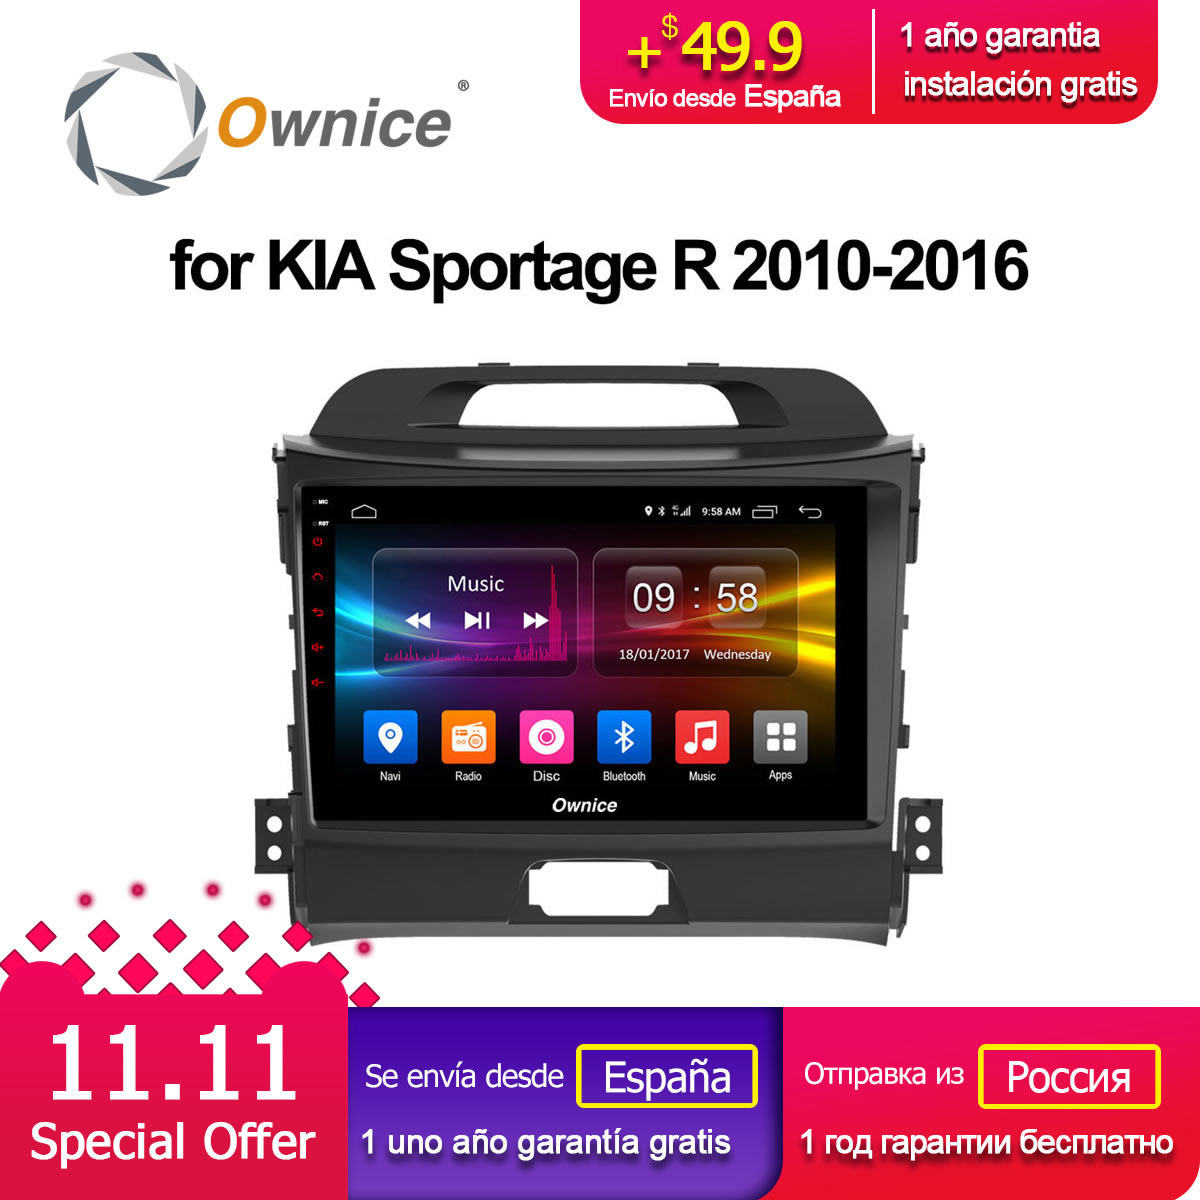 Ownice C500+ G10 Android 8.1 car radio gps navi player dvd for kia Sportage 2010 2011 2012 2013 2014 2015 8 core 2GB RAM ownice c500 4g sim lte octa 8 core android 6 0 for kia ceed 2013 2015 car dvd player gps navi radio wifi 4g bt 2gb ram 32g rom